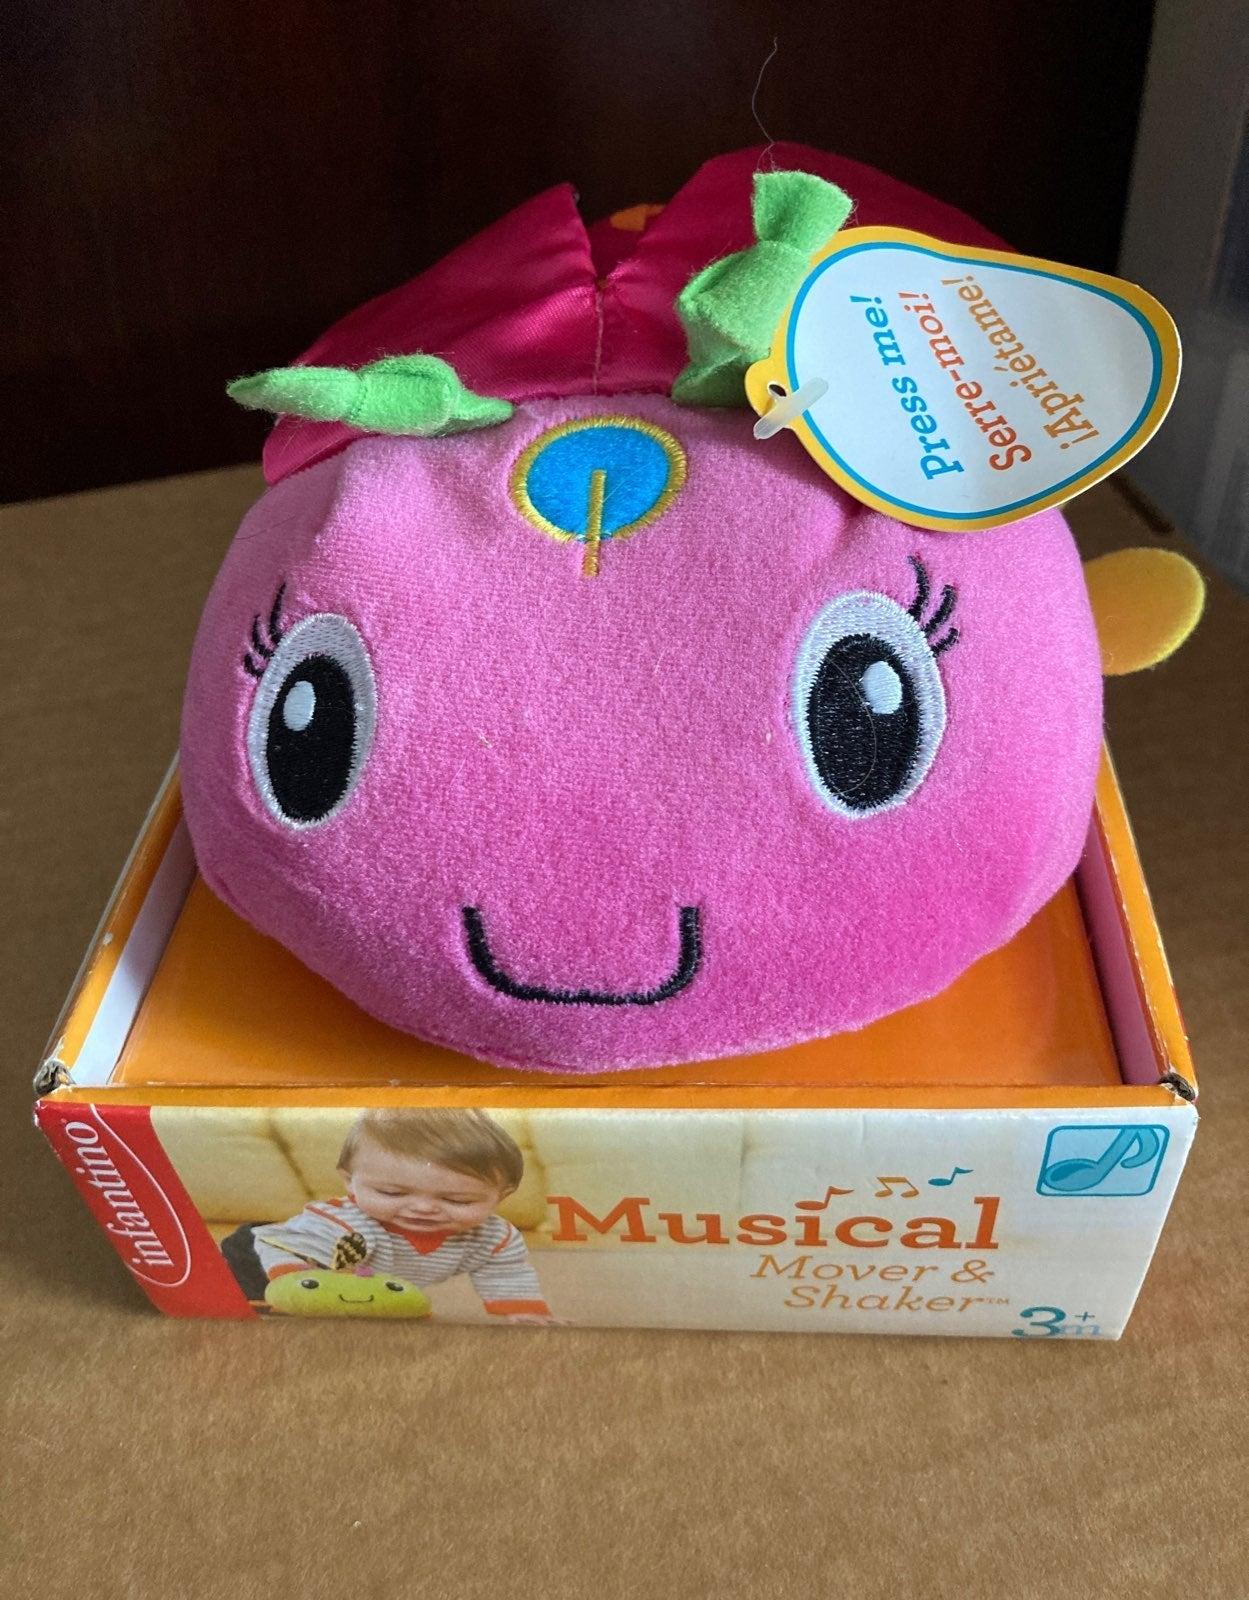 Infantino Musical mover & shaker ladybug